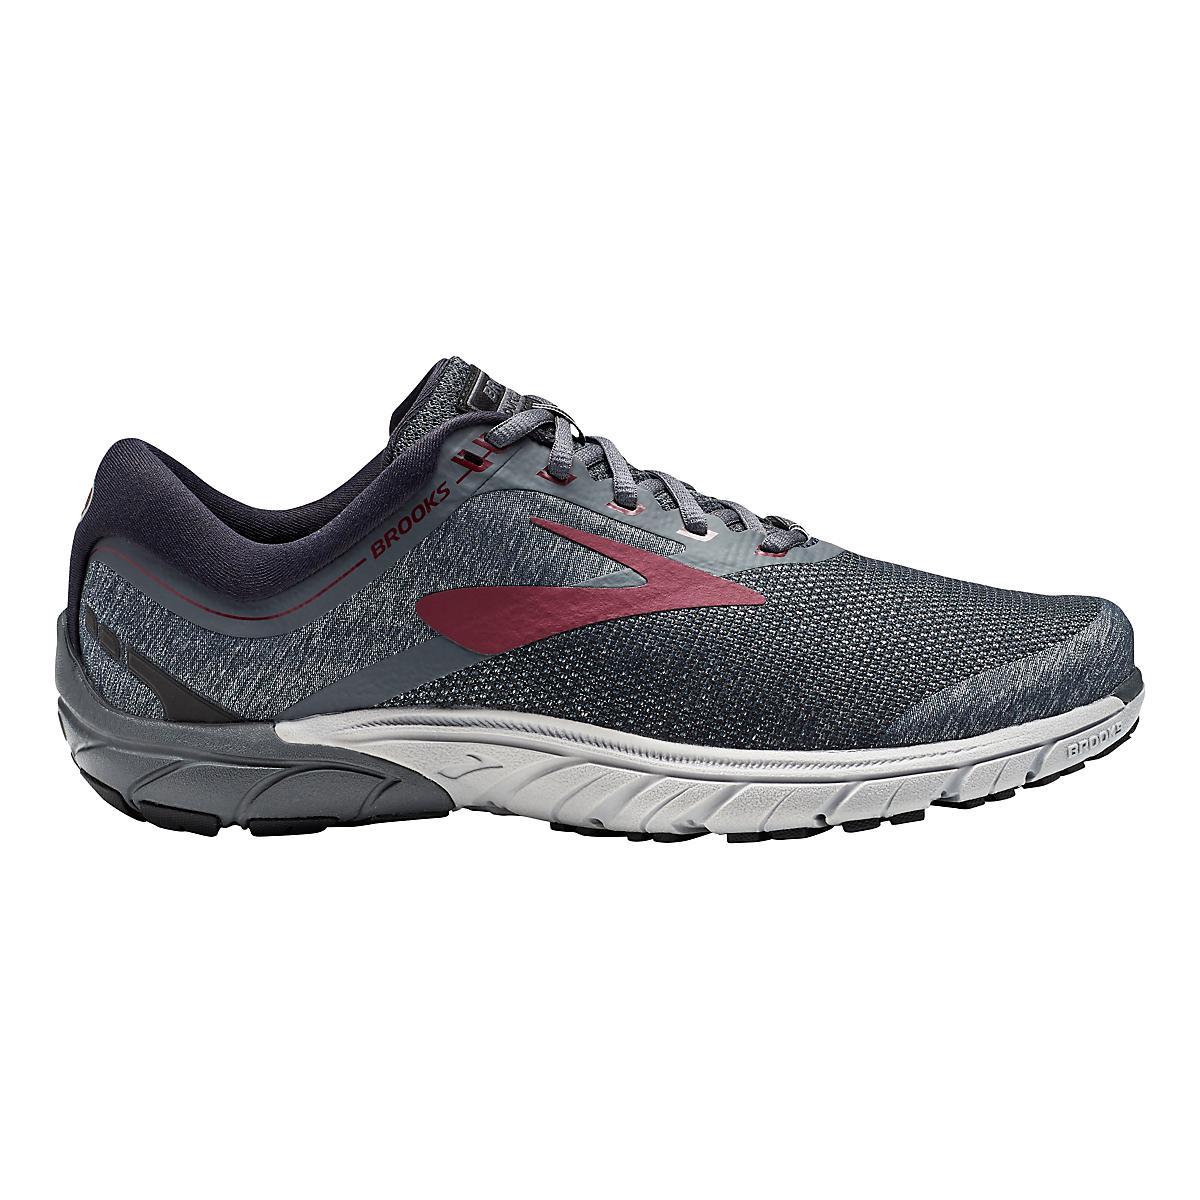 0d461ec9508 Mens Brooks PureCadence 7 Running Shoe at Road Runner Sports